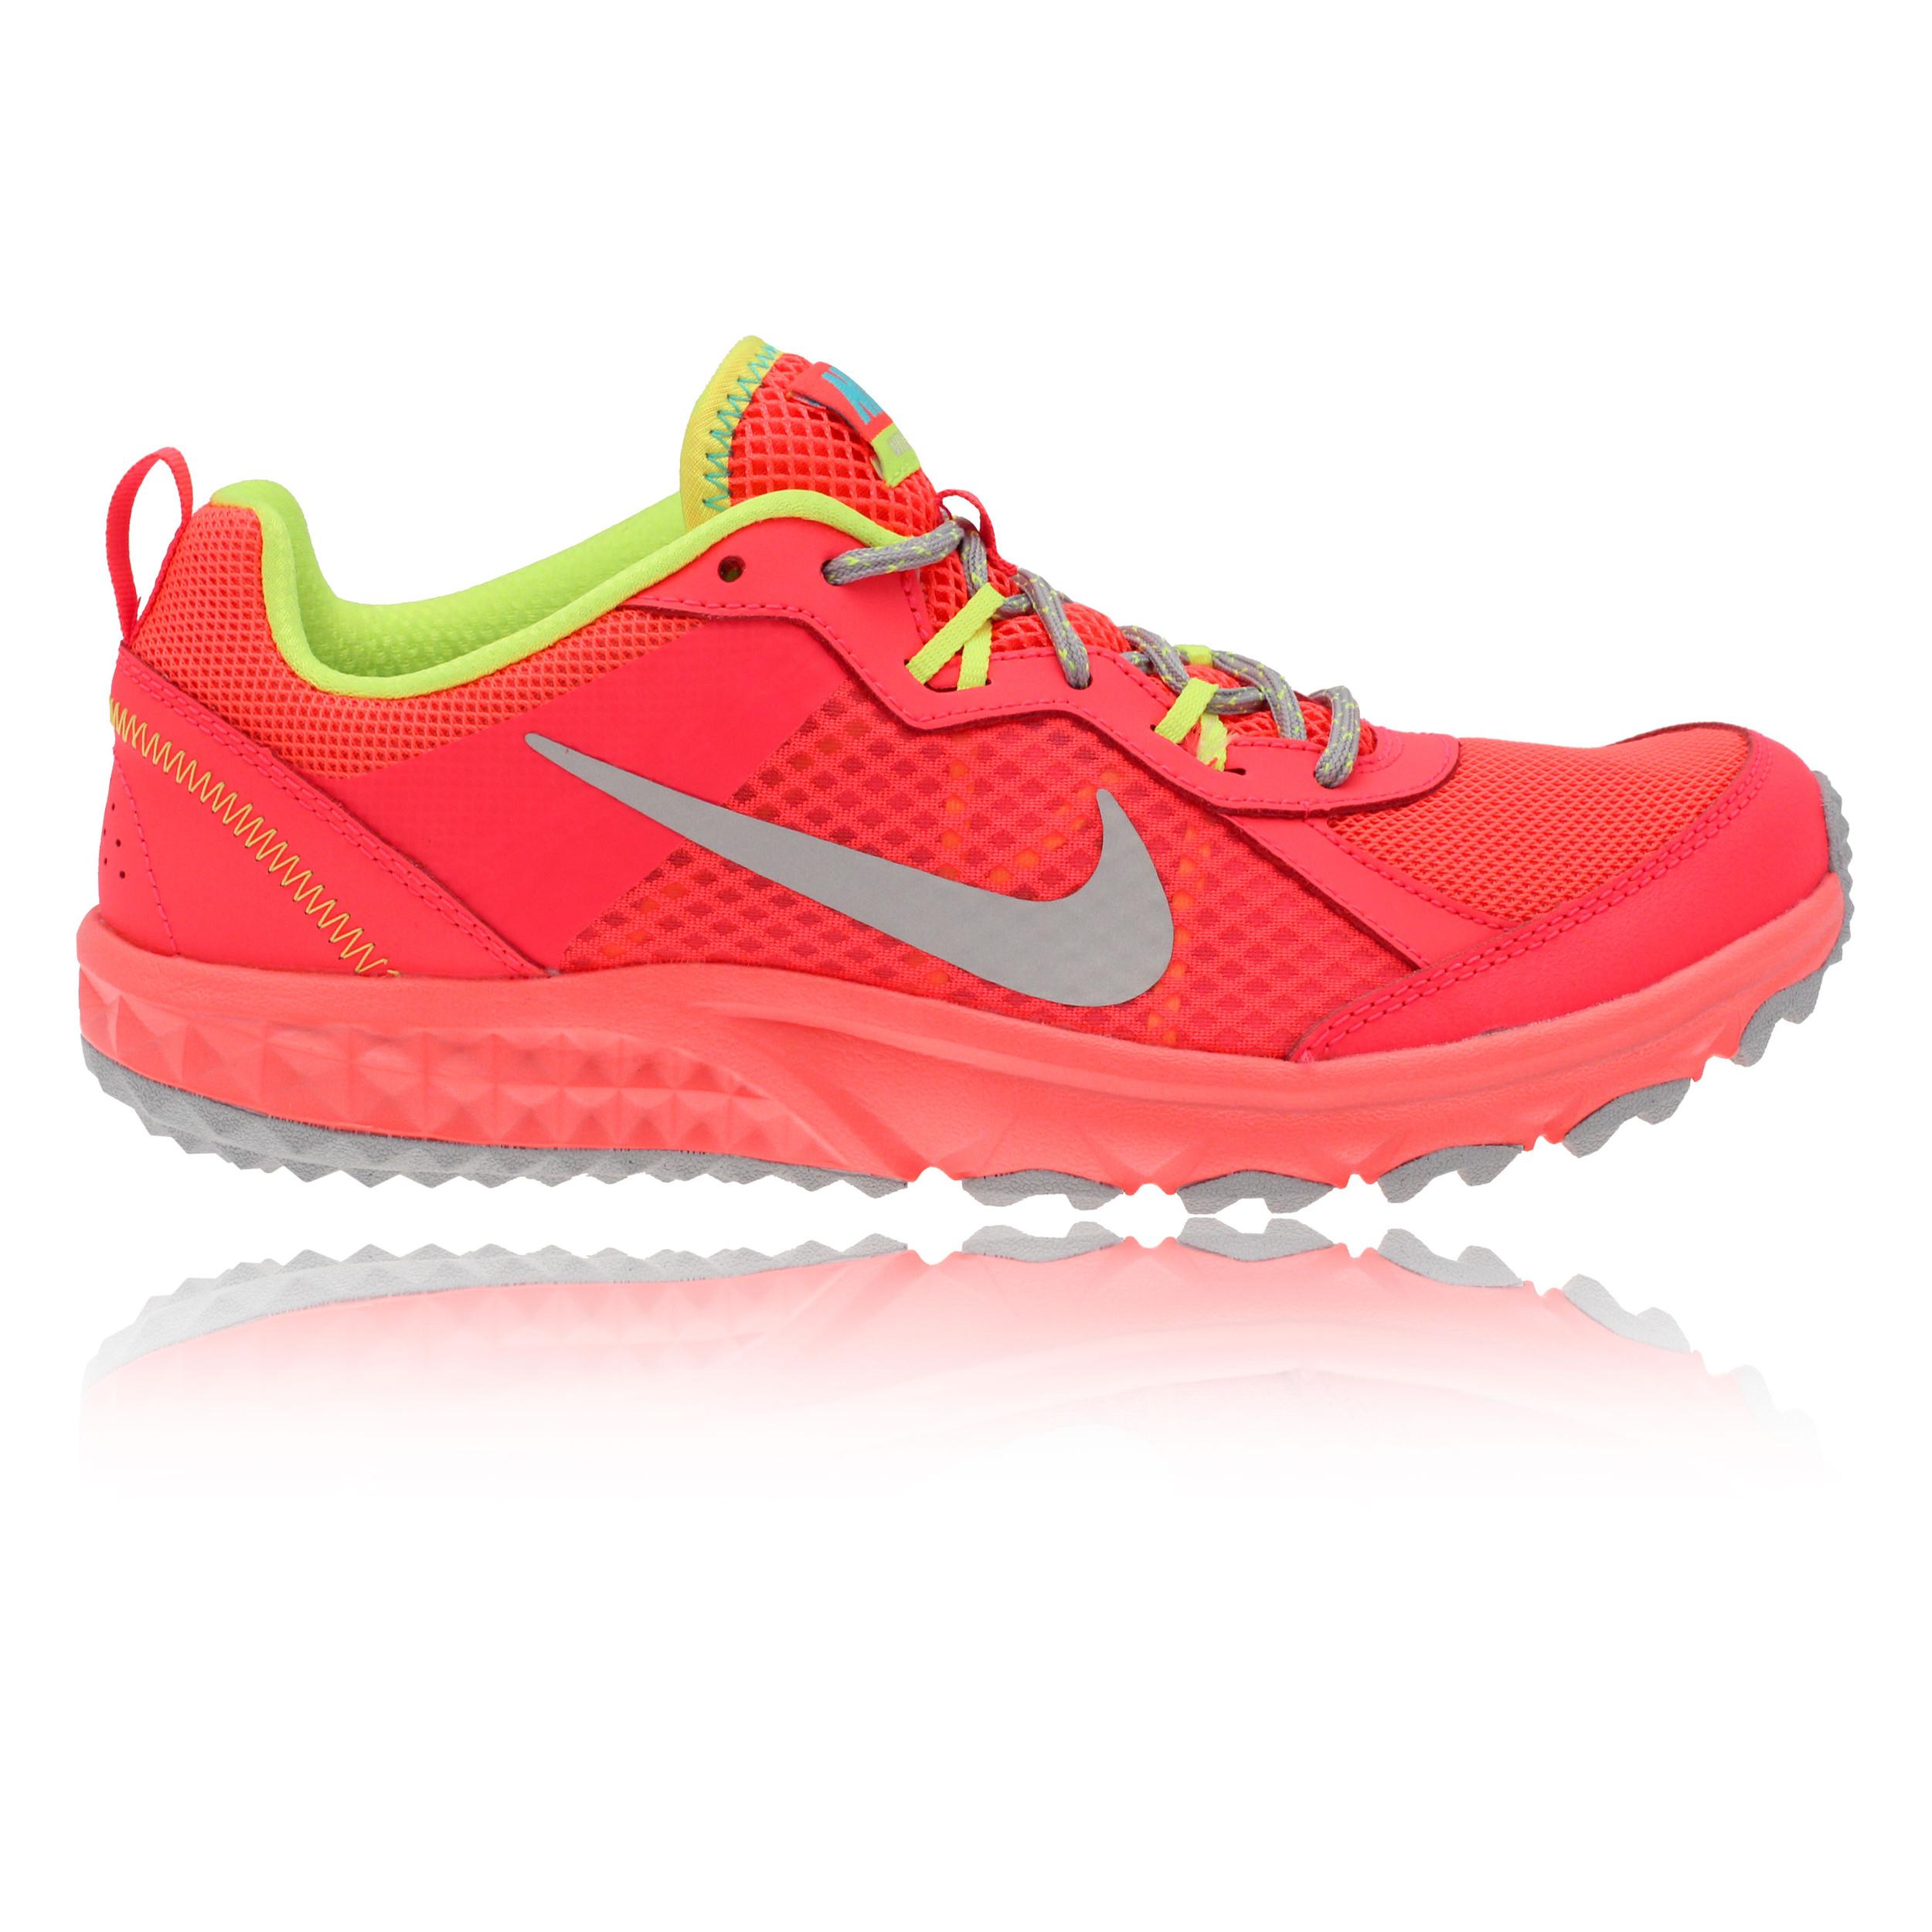 Nike Wild Trail Women's Trail Running Shoes - HO14 - 45%